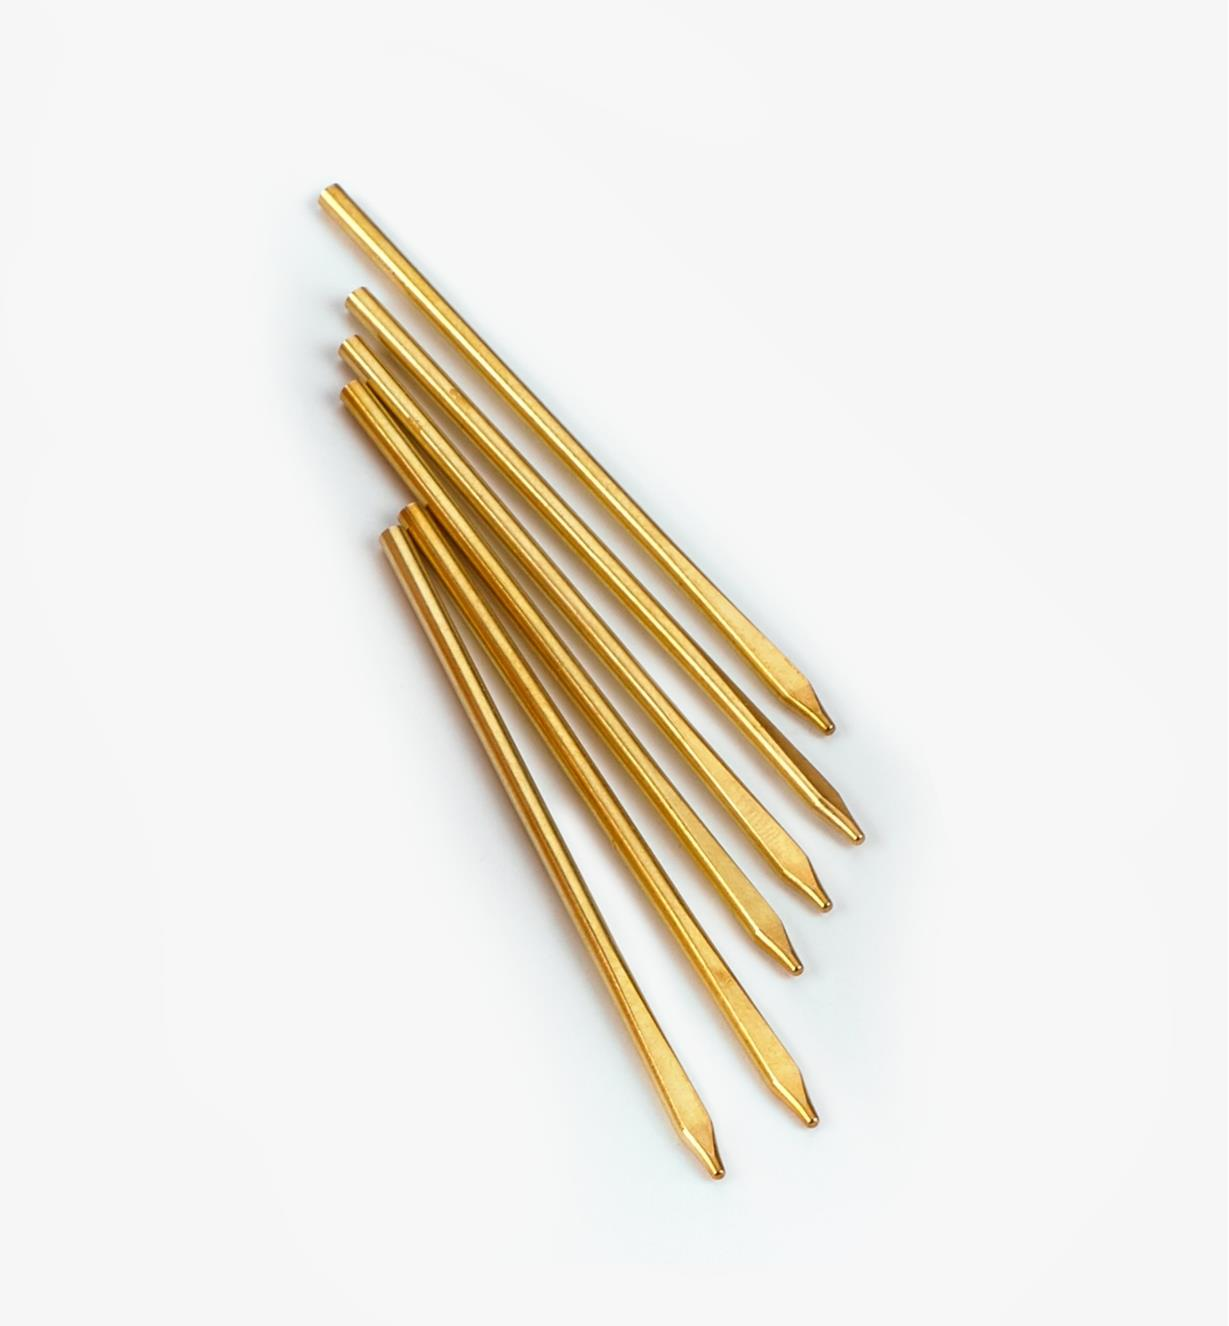 97K0930 - Lacing Needles, pkg. of 6